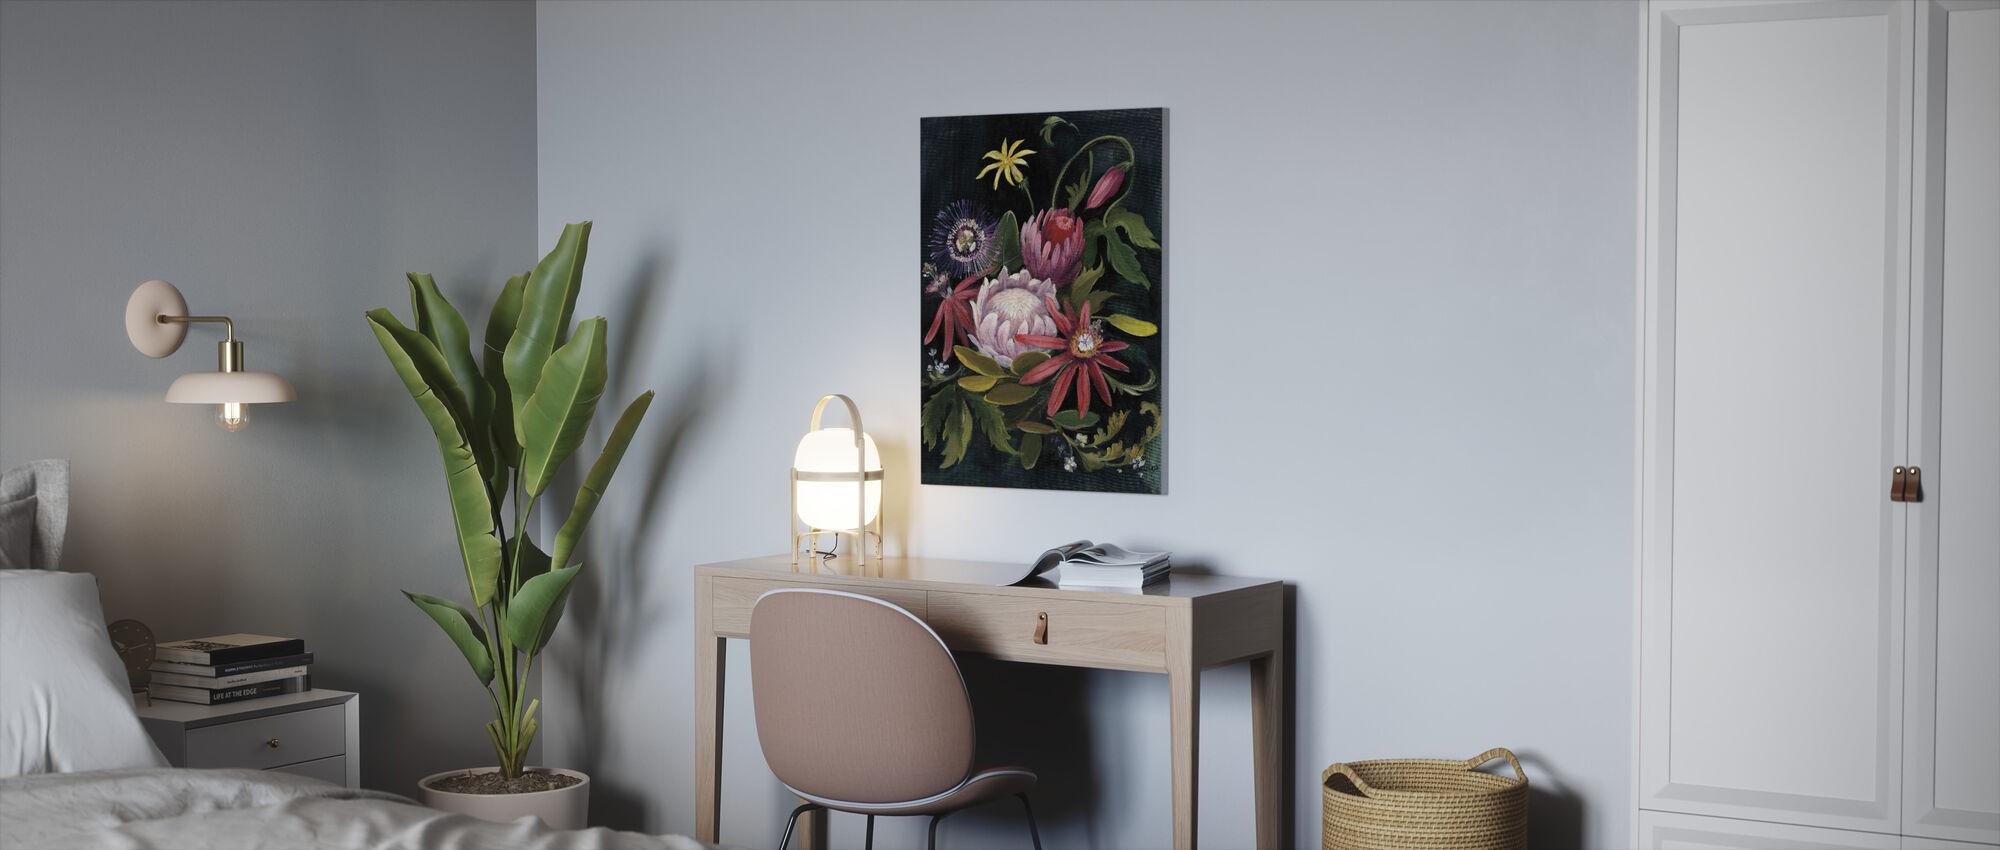 Flower Show II - Canvas print - Office